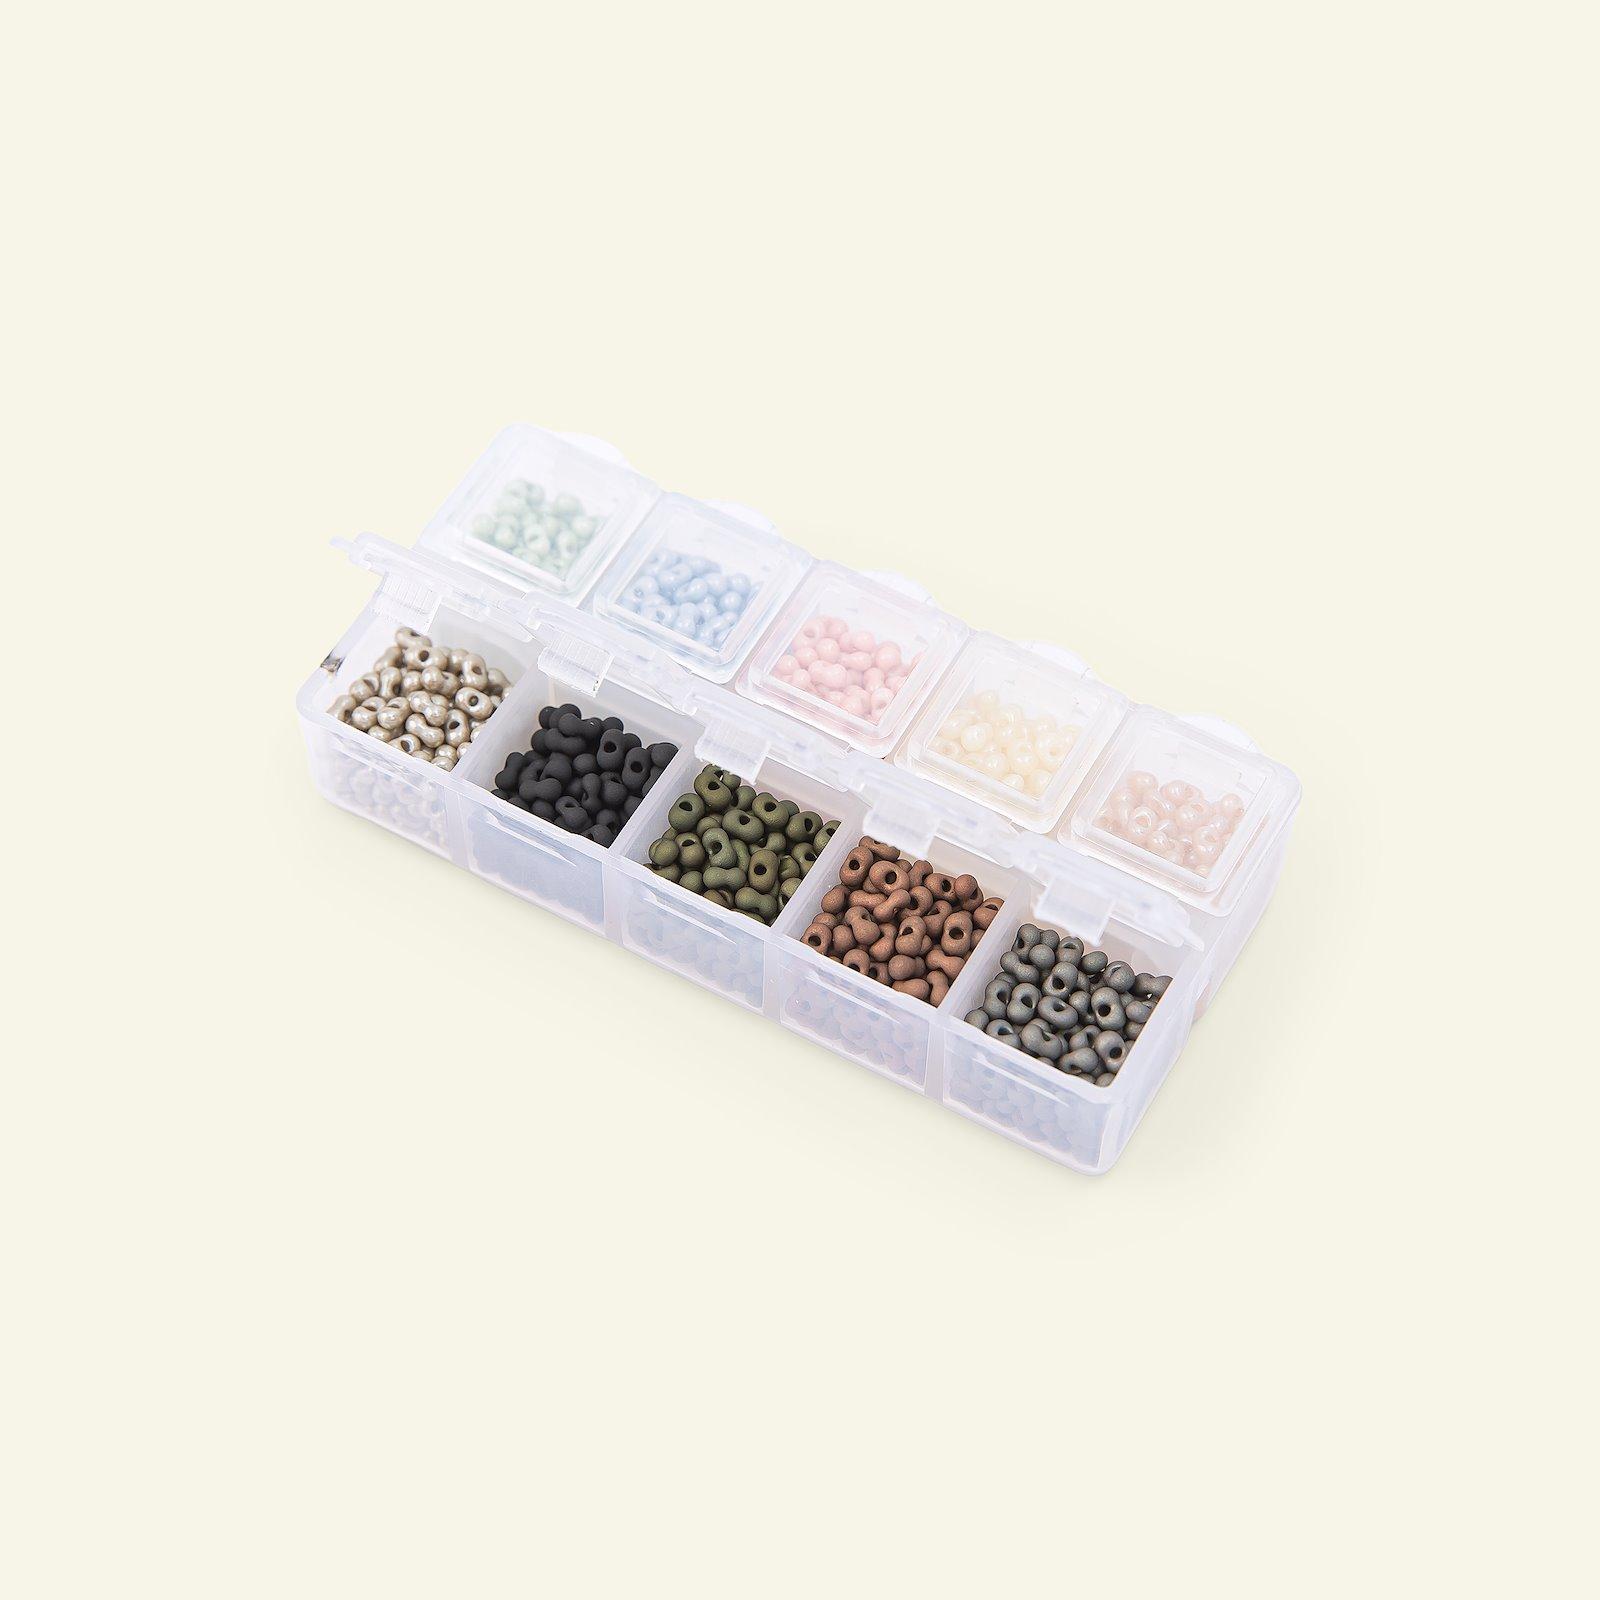 Matsuno glassbead peanut 2x4mm 10col 40g 47199_pack_b